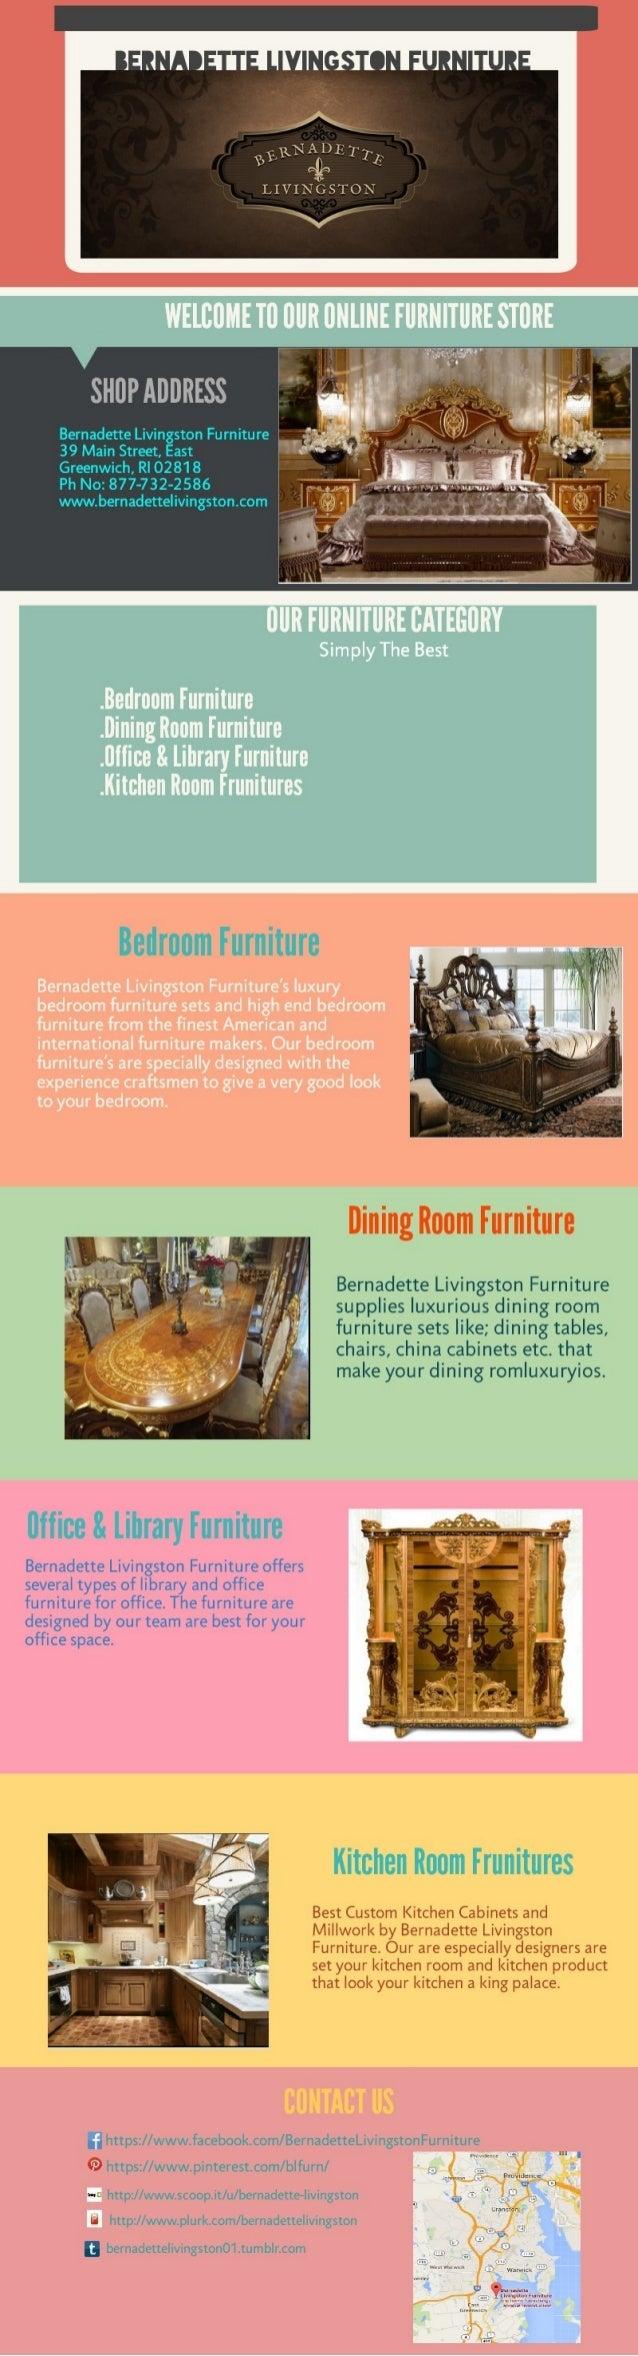 LIVI; U0027ESu0027lu0027O. U0027 SHUP ADDRESS Bernadette Livingston Furniture U0027